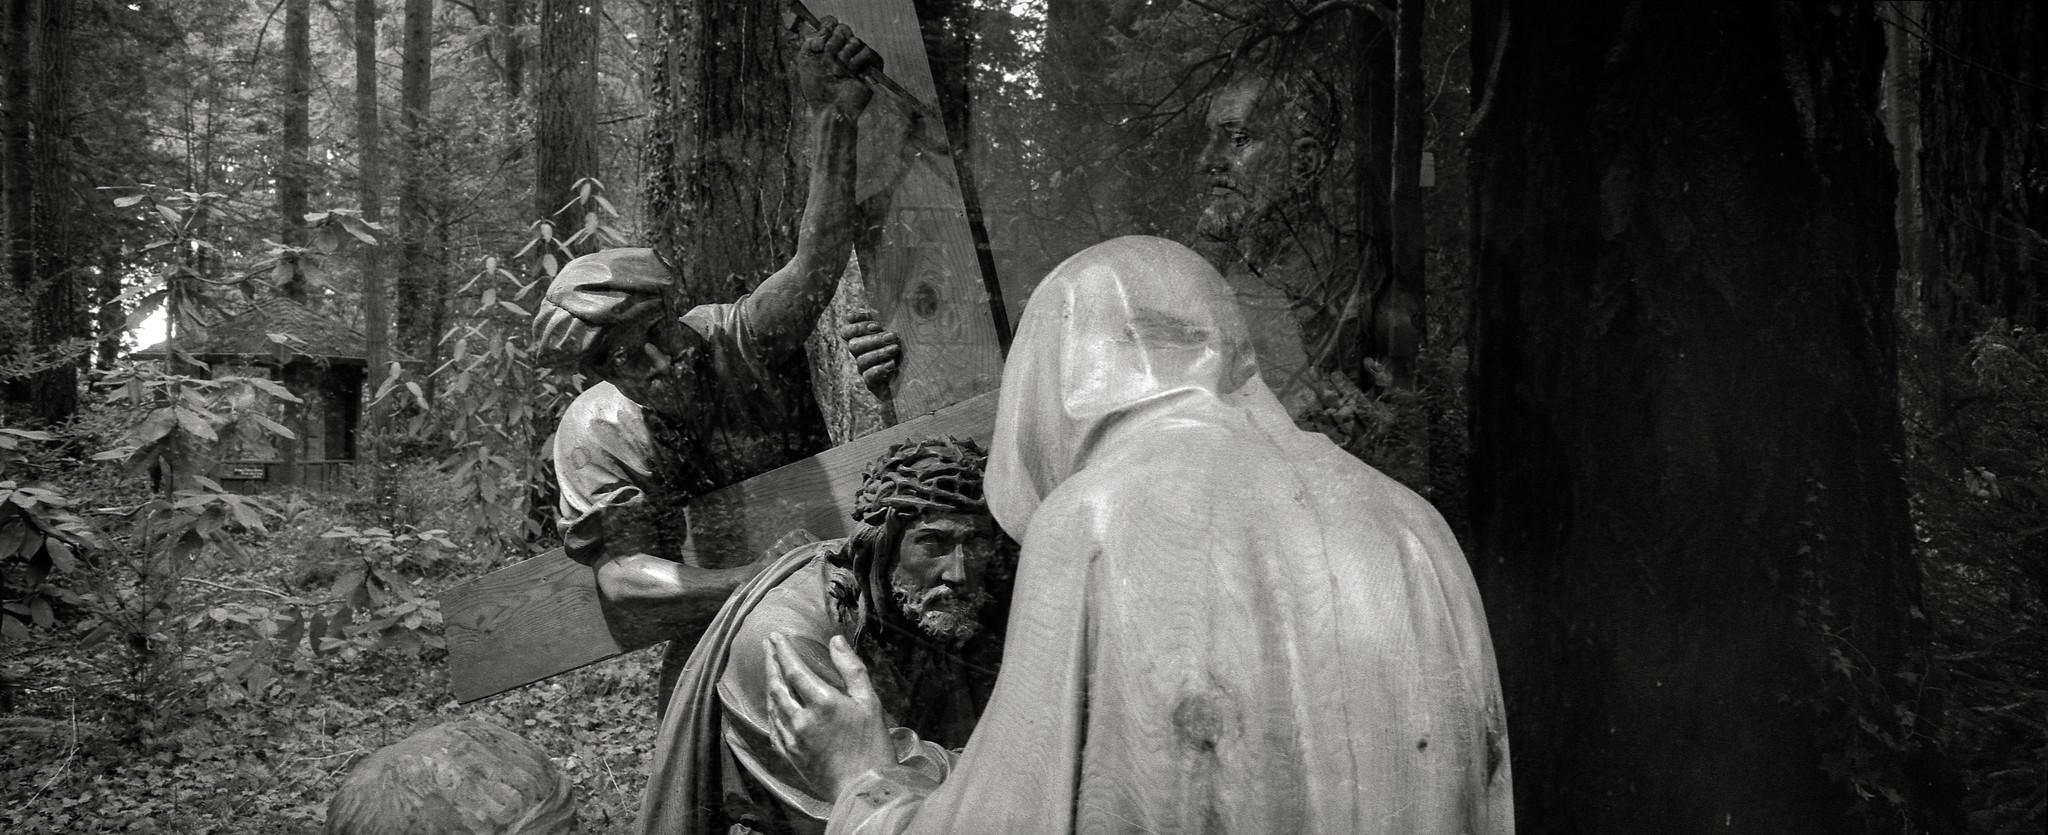 Jesus, Portland | by austin granger